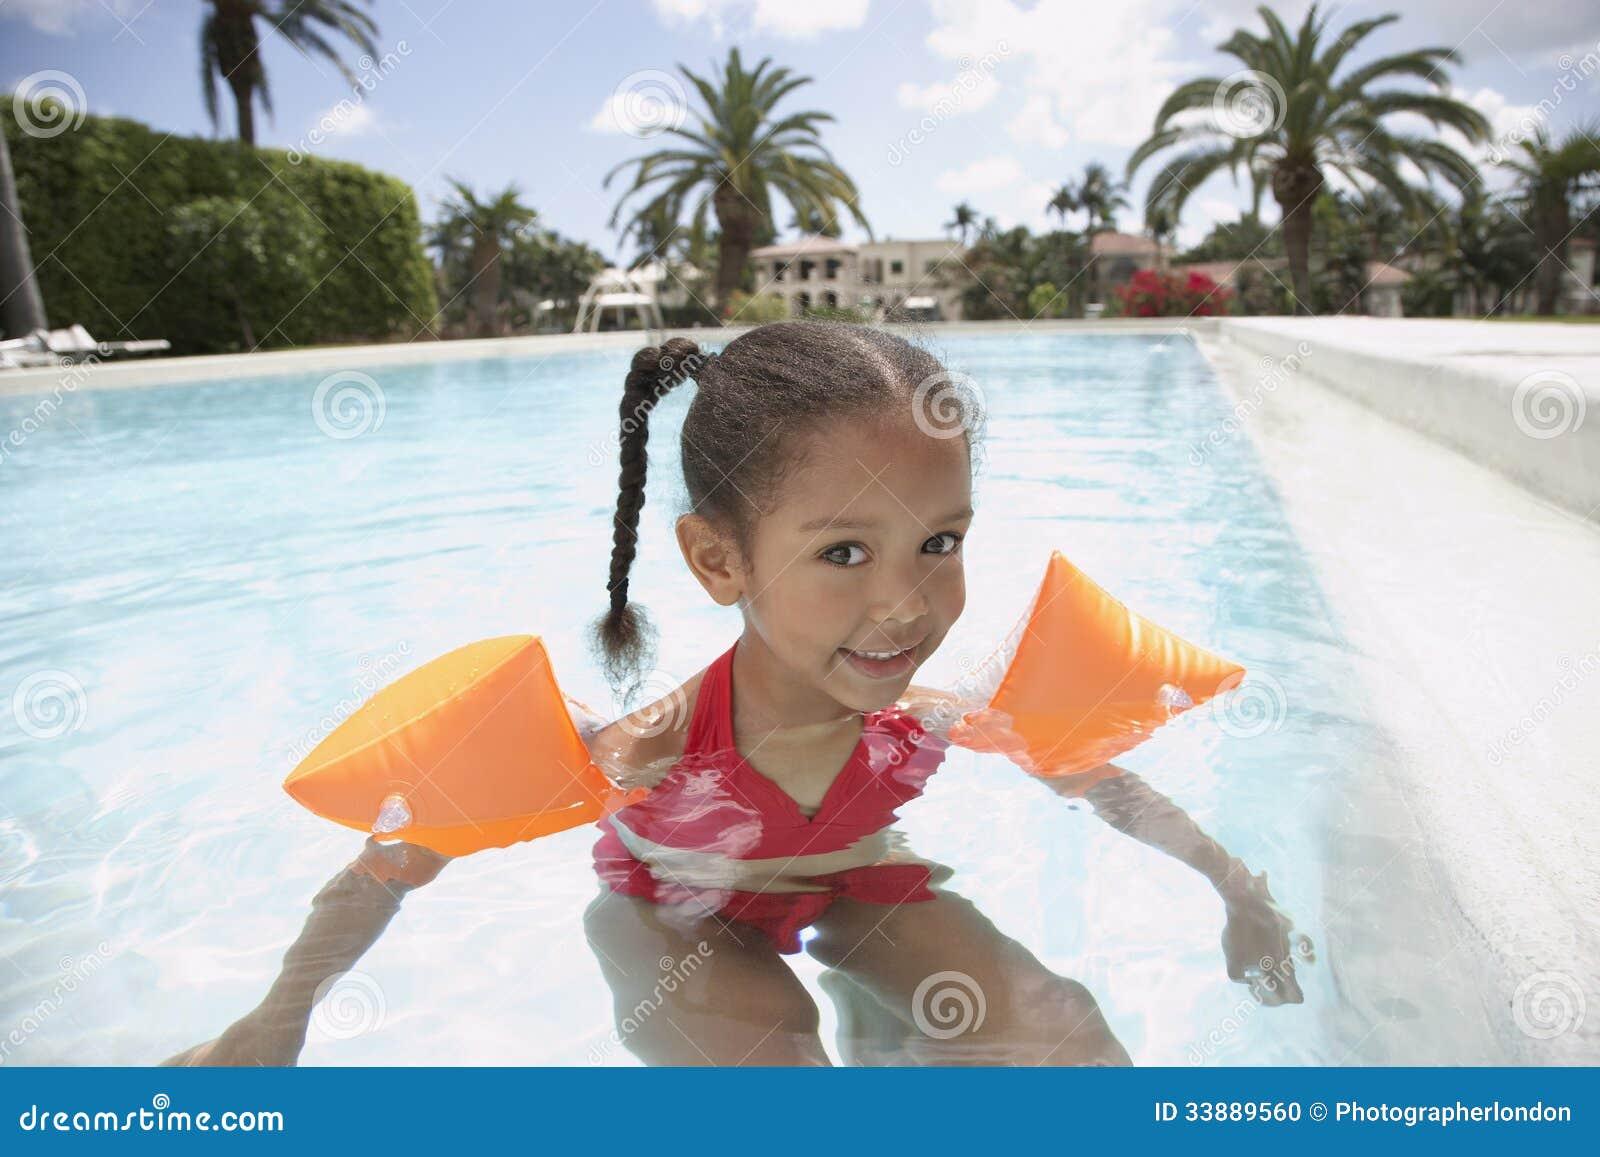 Swimming Pool Wings : Girl wearing water wings in swimming pool stock photo